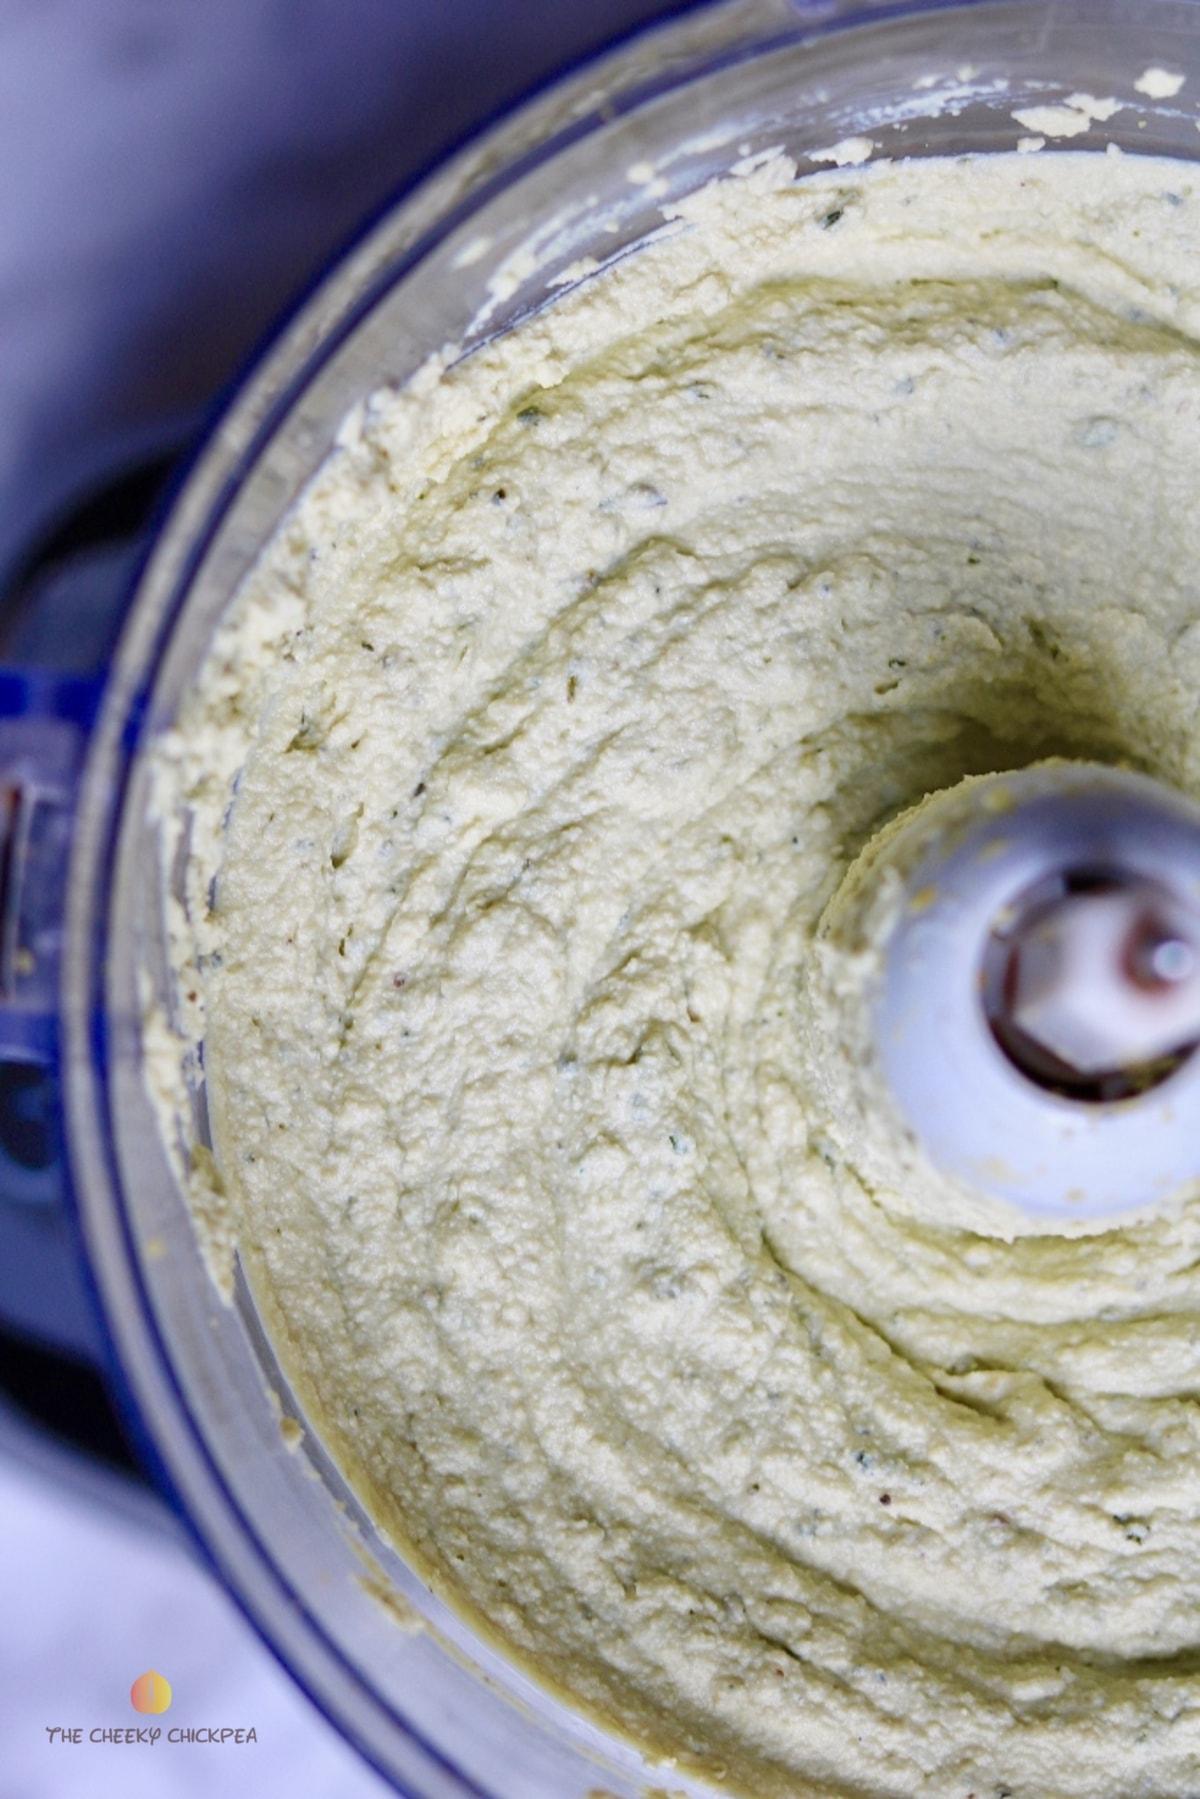 vegan ricotta cheese in a food processor